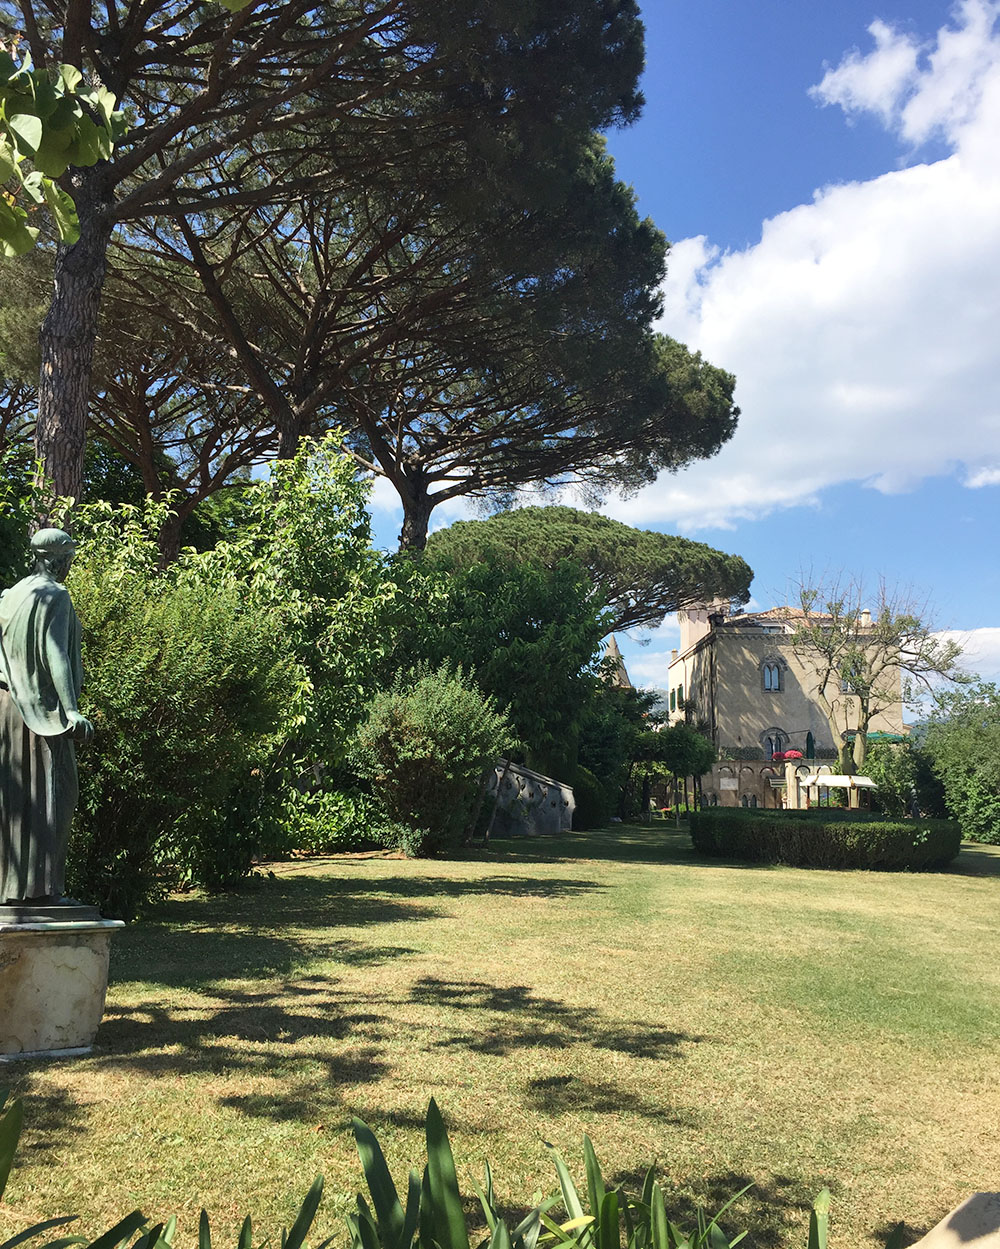 Travel tips ideas ravello costiera amalfitana italy cool chic style fashion - Giardini di villa cimbrone ...